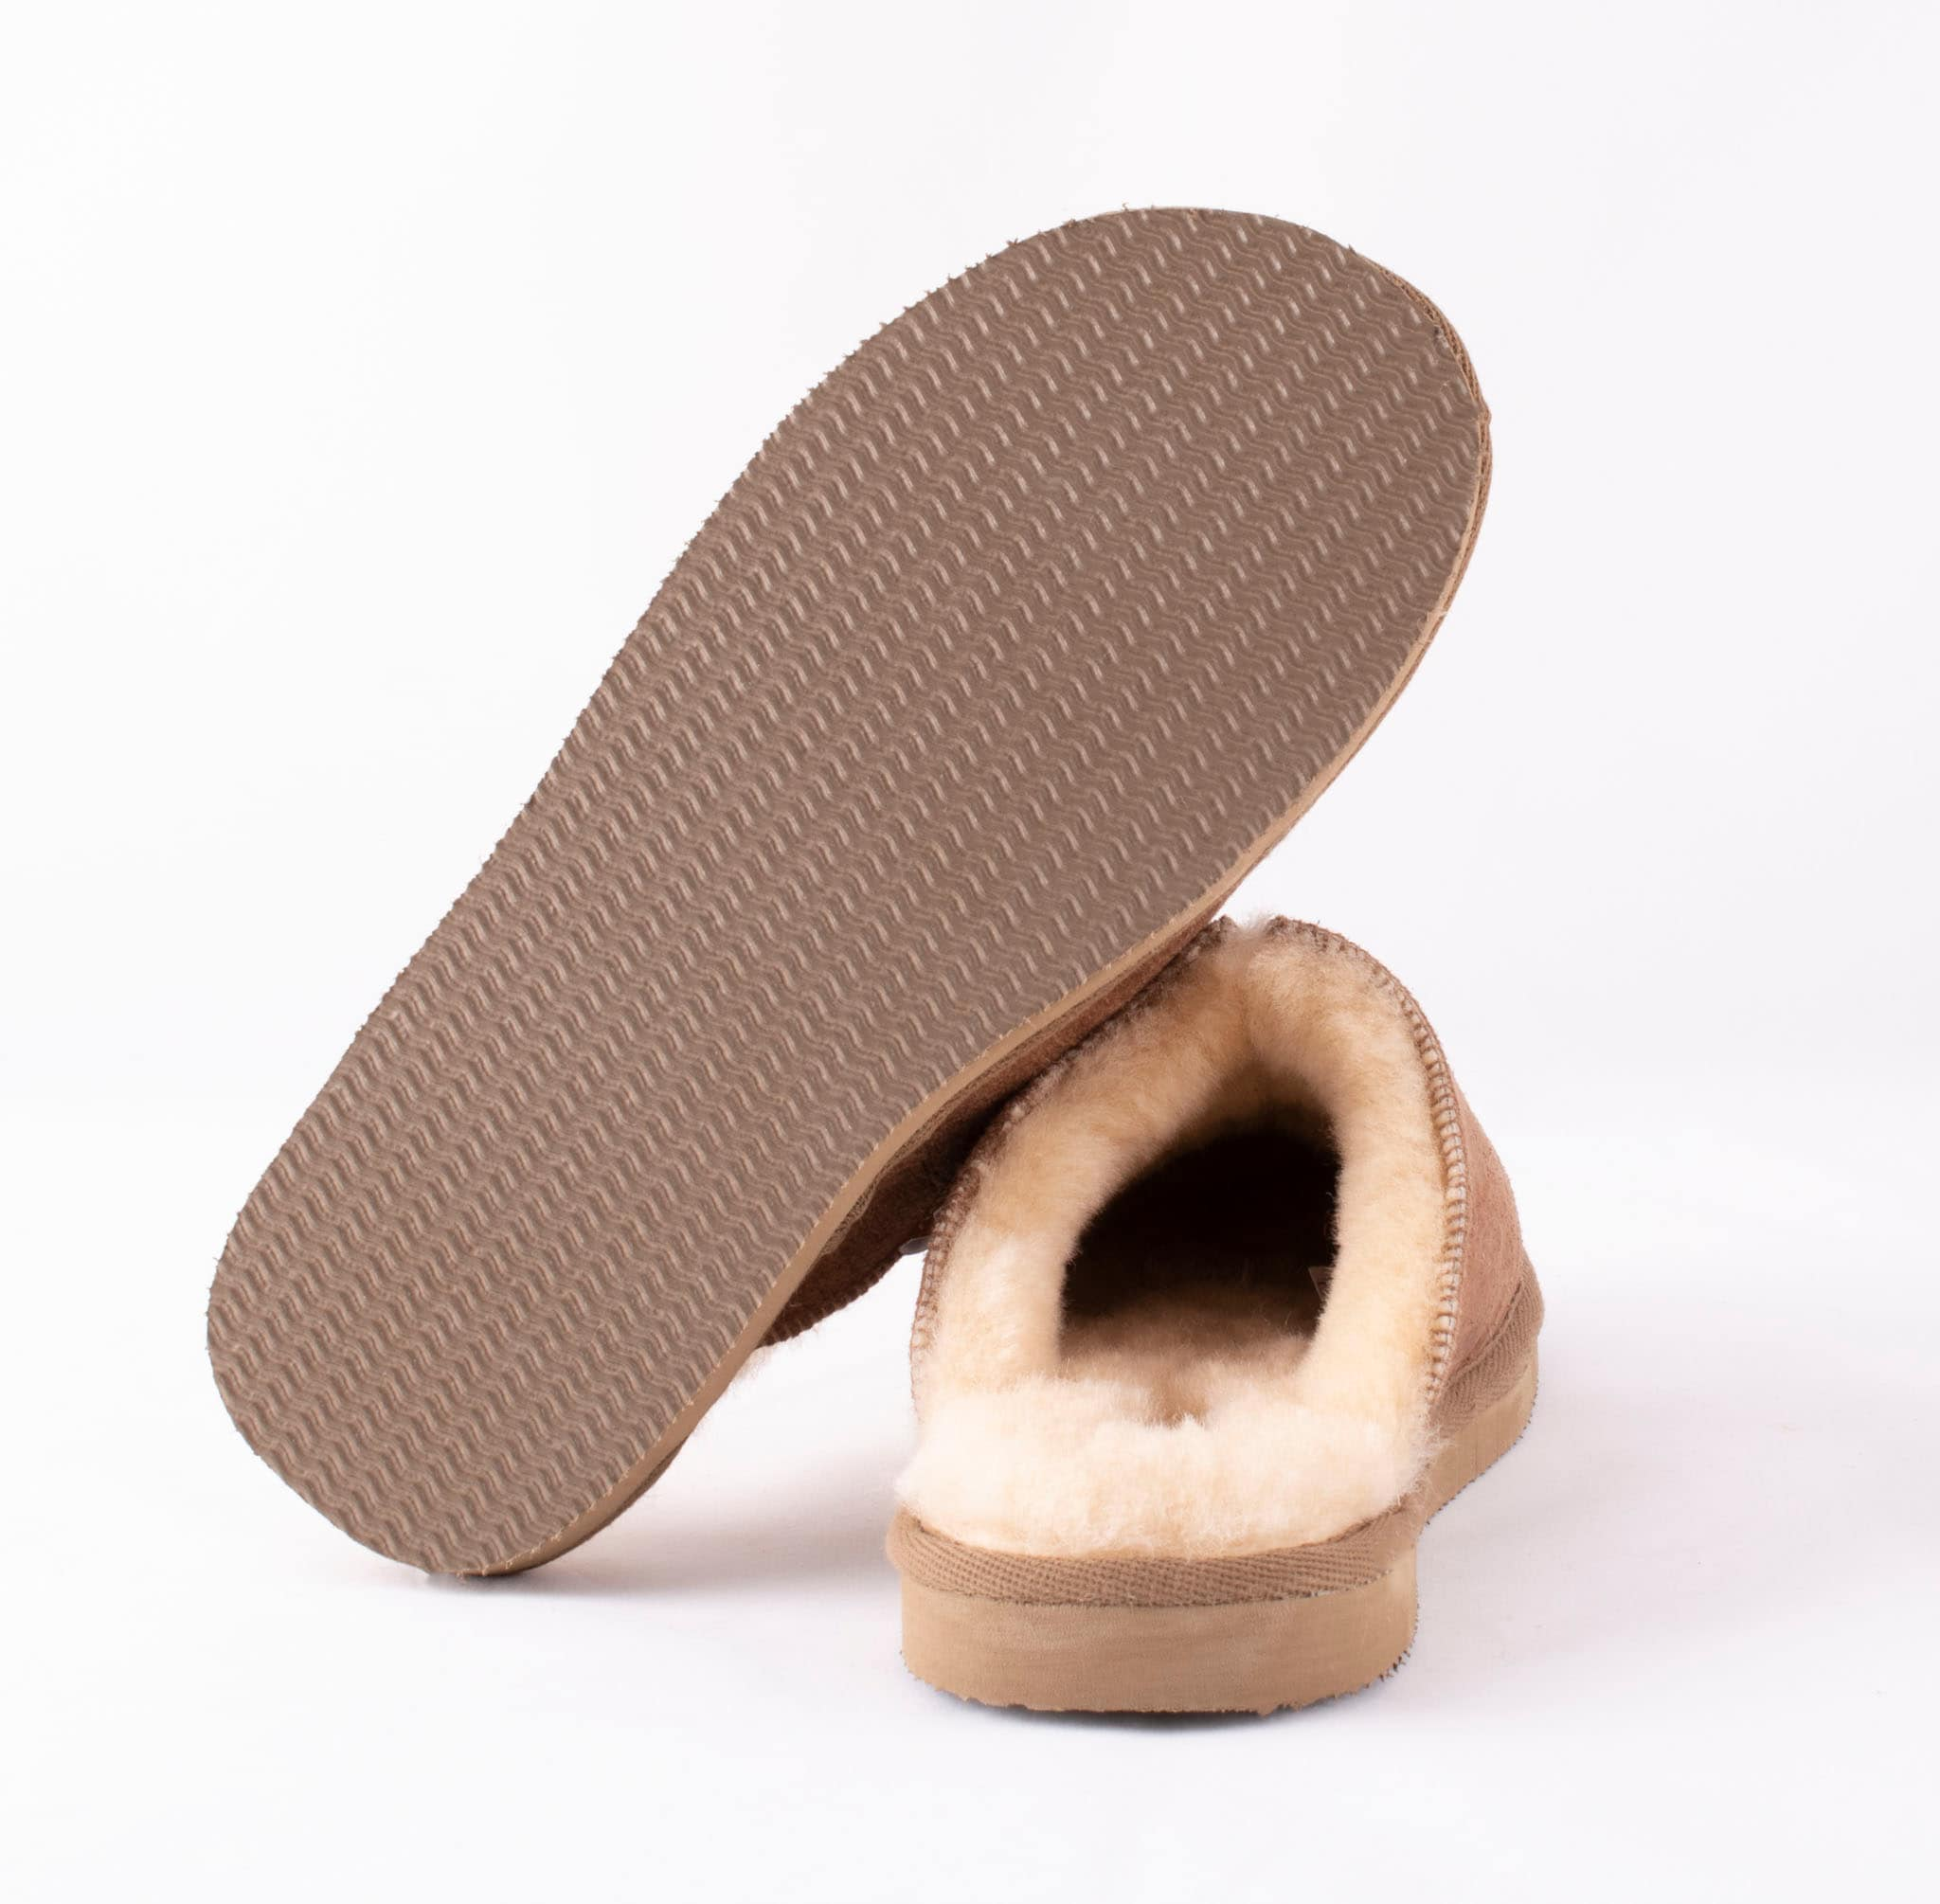 Karla sheepskin slippers